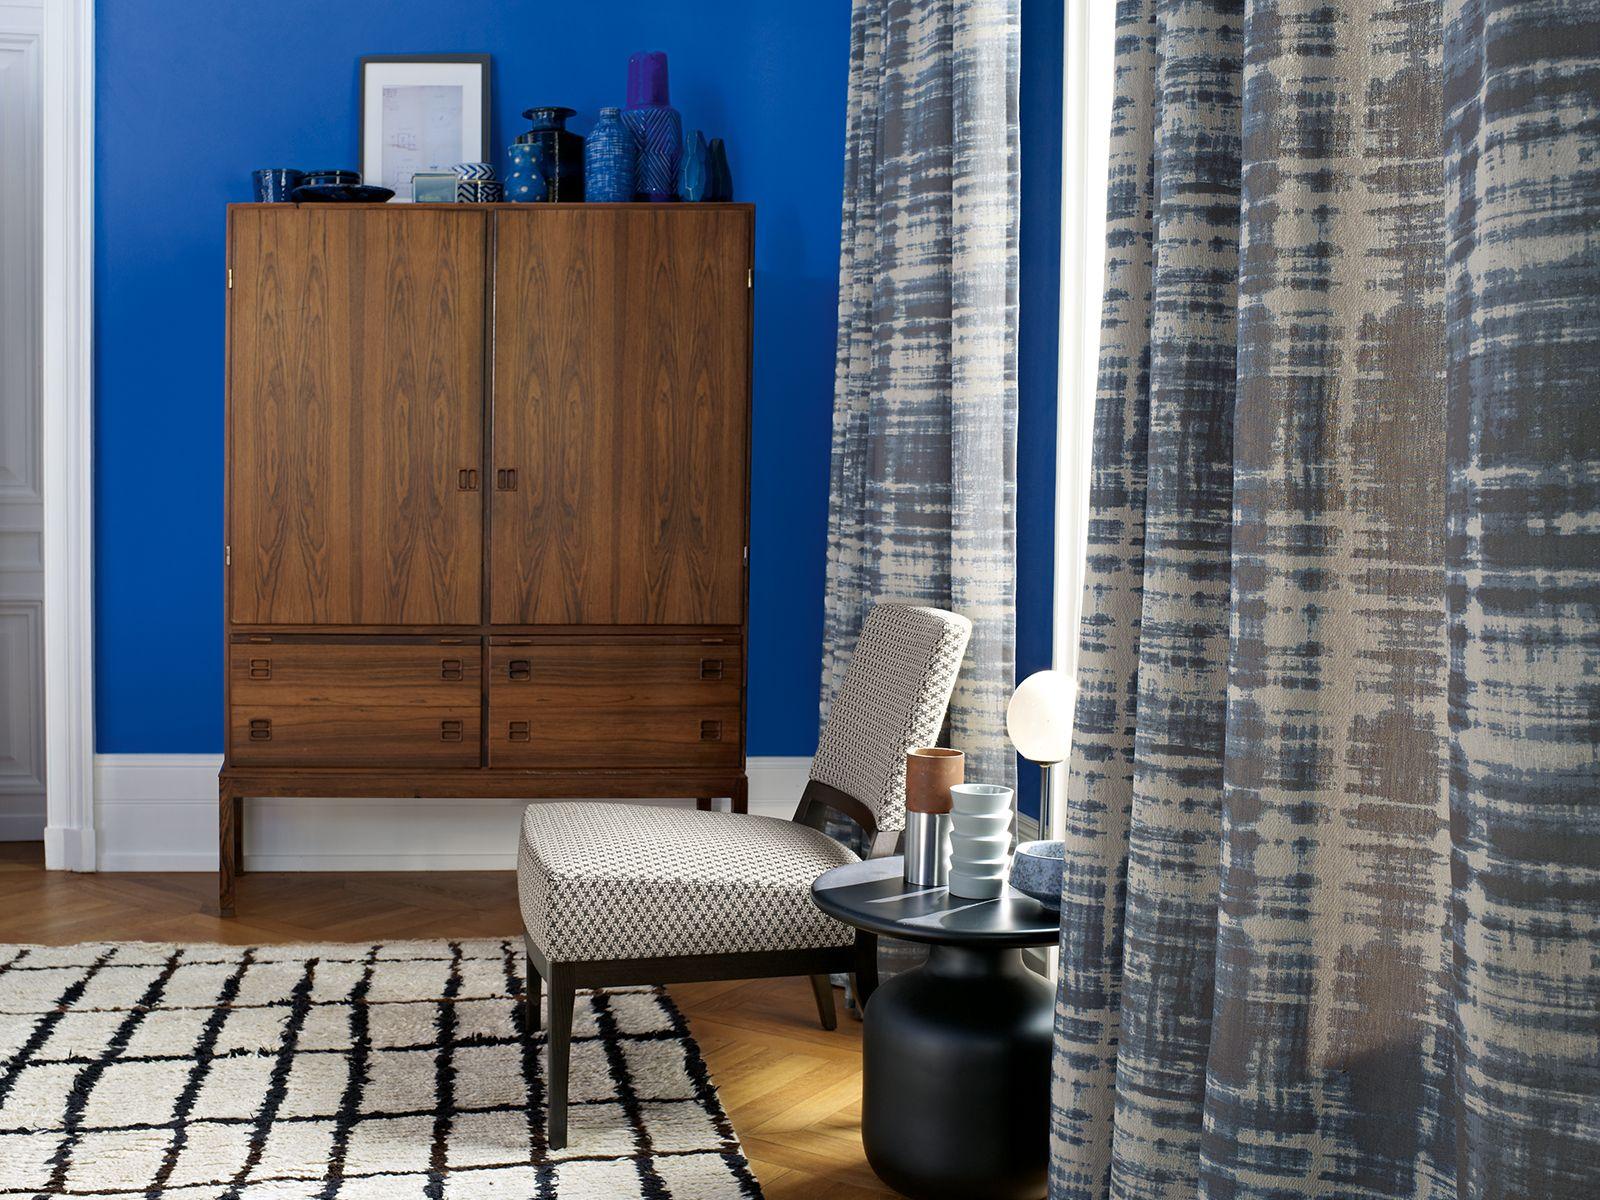 Zimmer + Rohde, living room, Wohnzimmer, Stuhl, chair, drapery ...